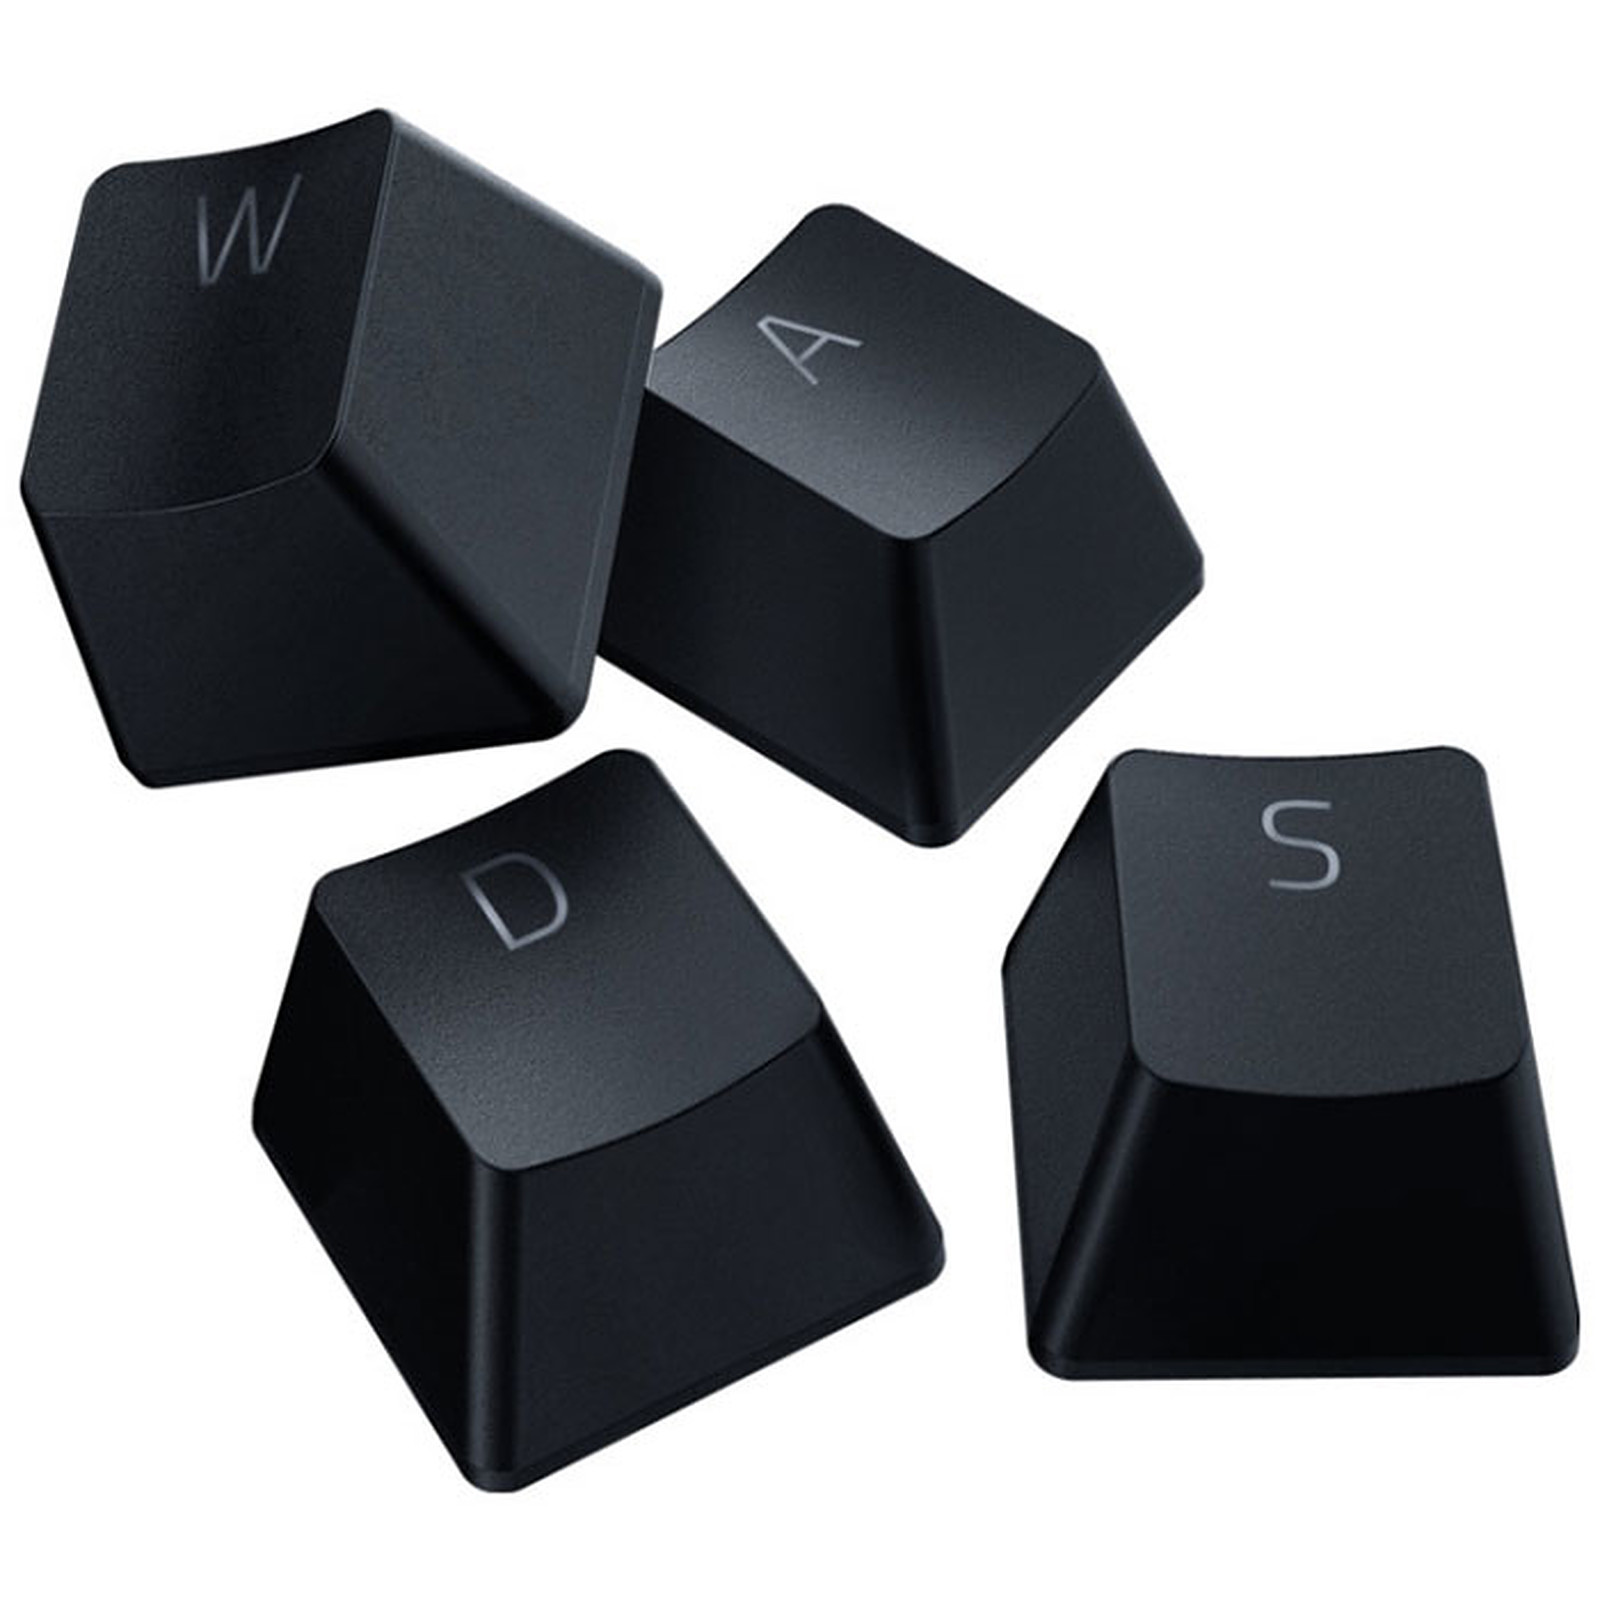 Razer PBT Keycap Upgrade Set (Noir)